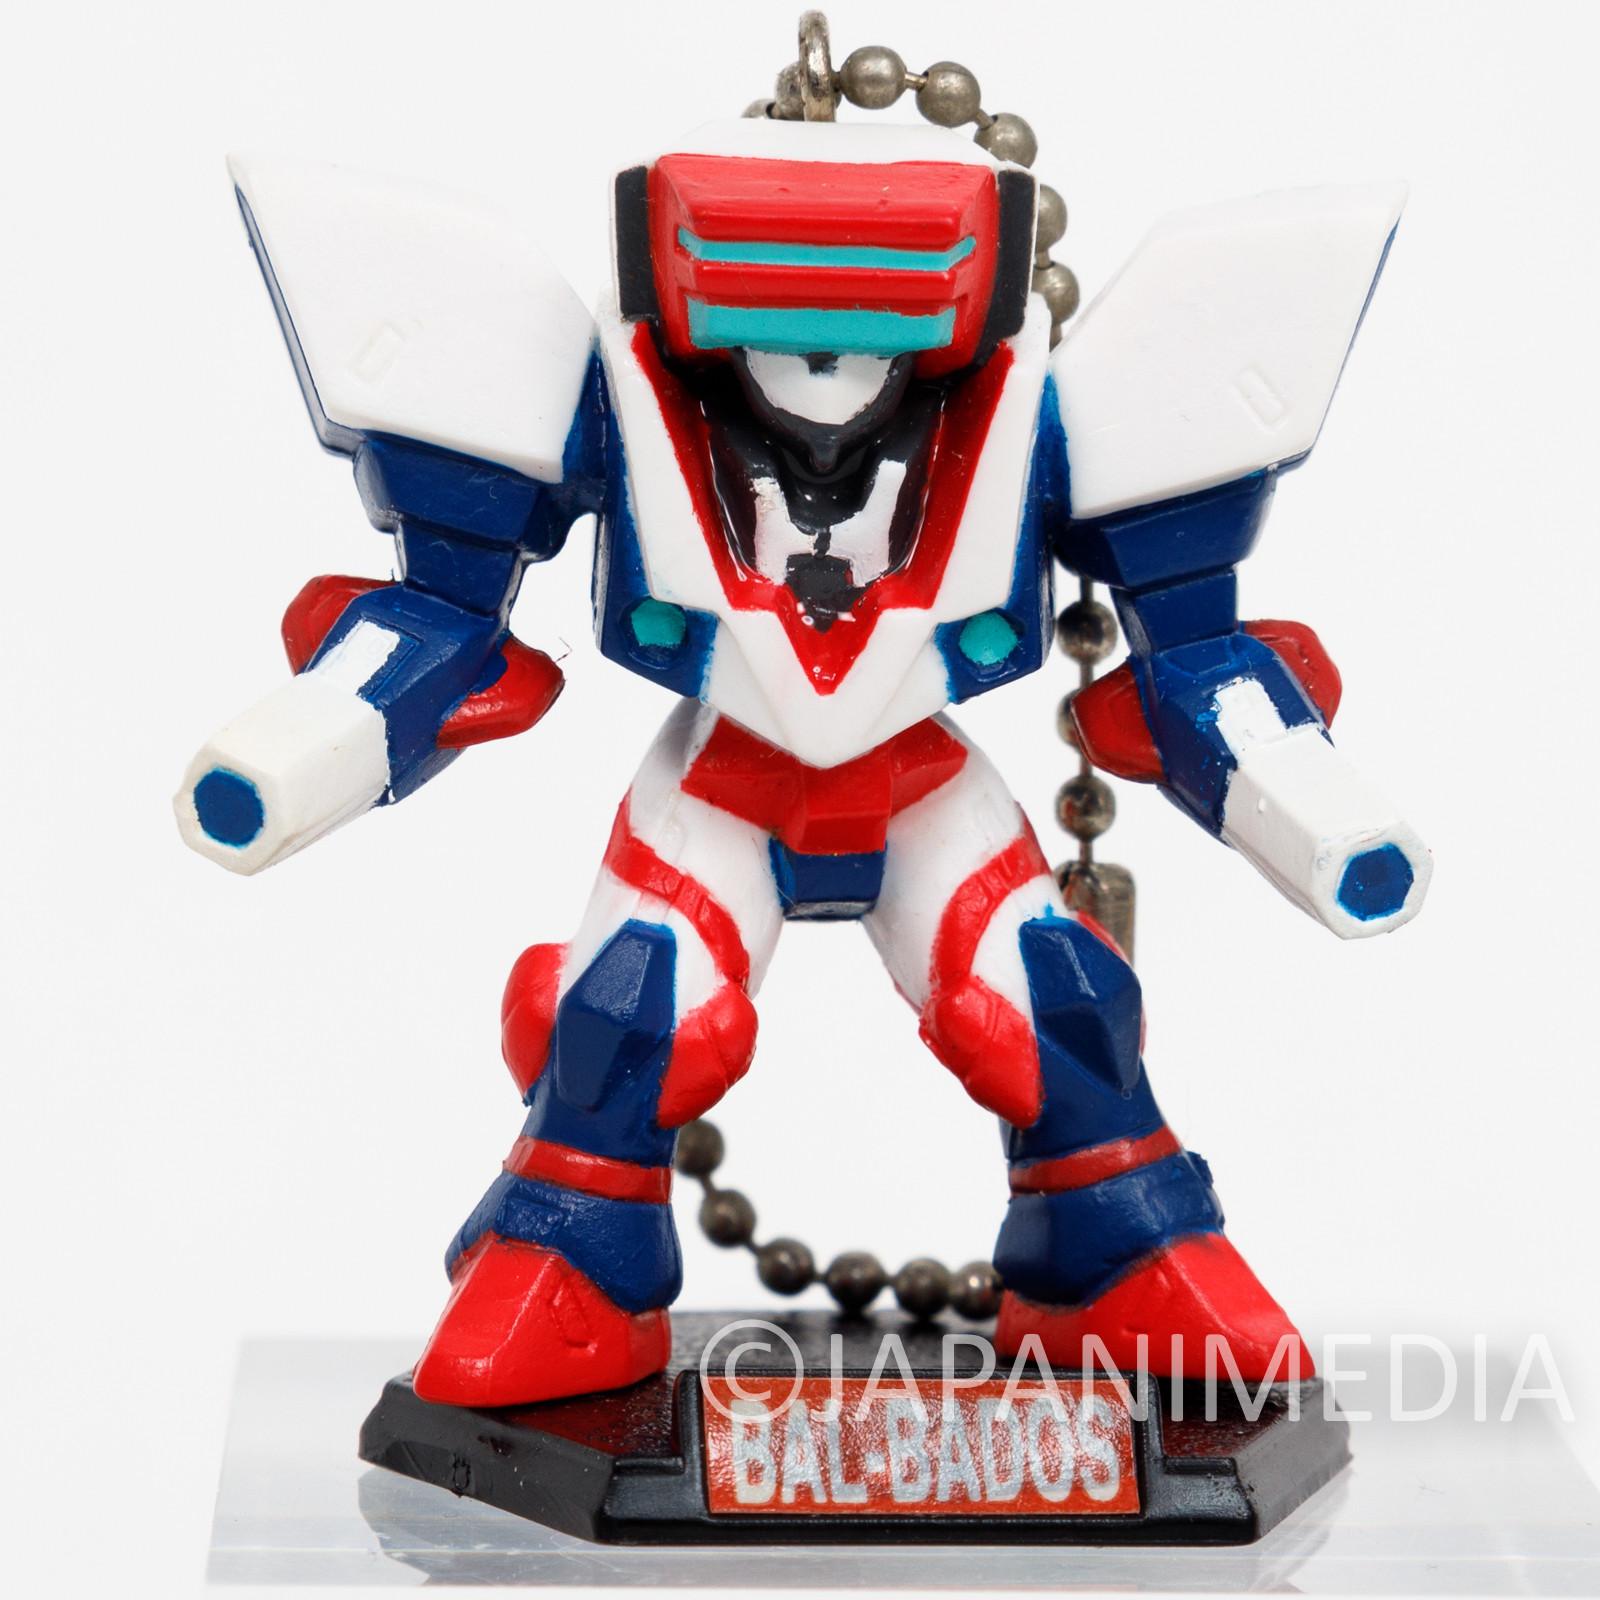 Virtual On: Cyber Troopers Bal Bados XBV-819-TR4 Figure Keychain JAPAN SEGA